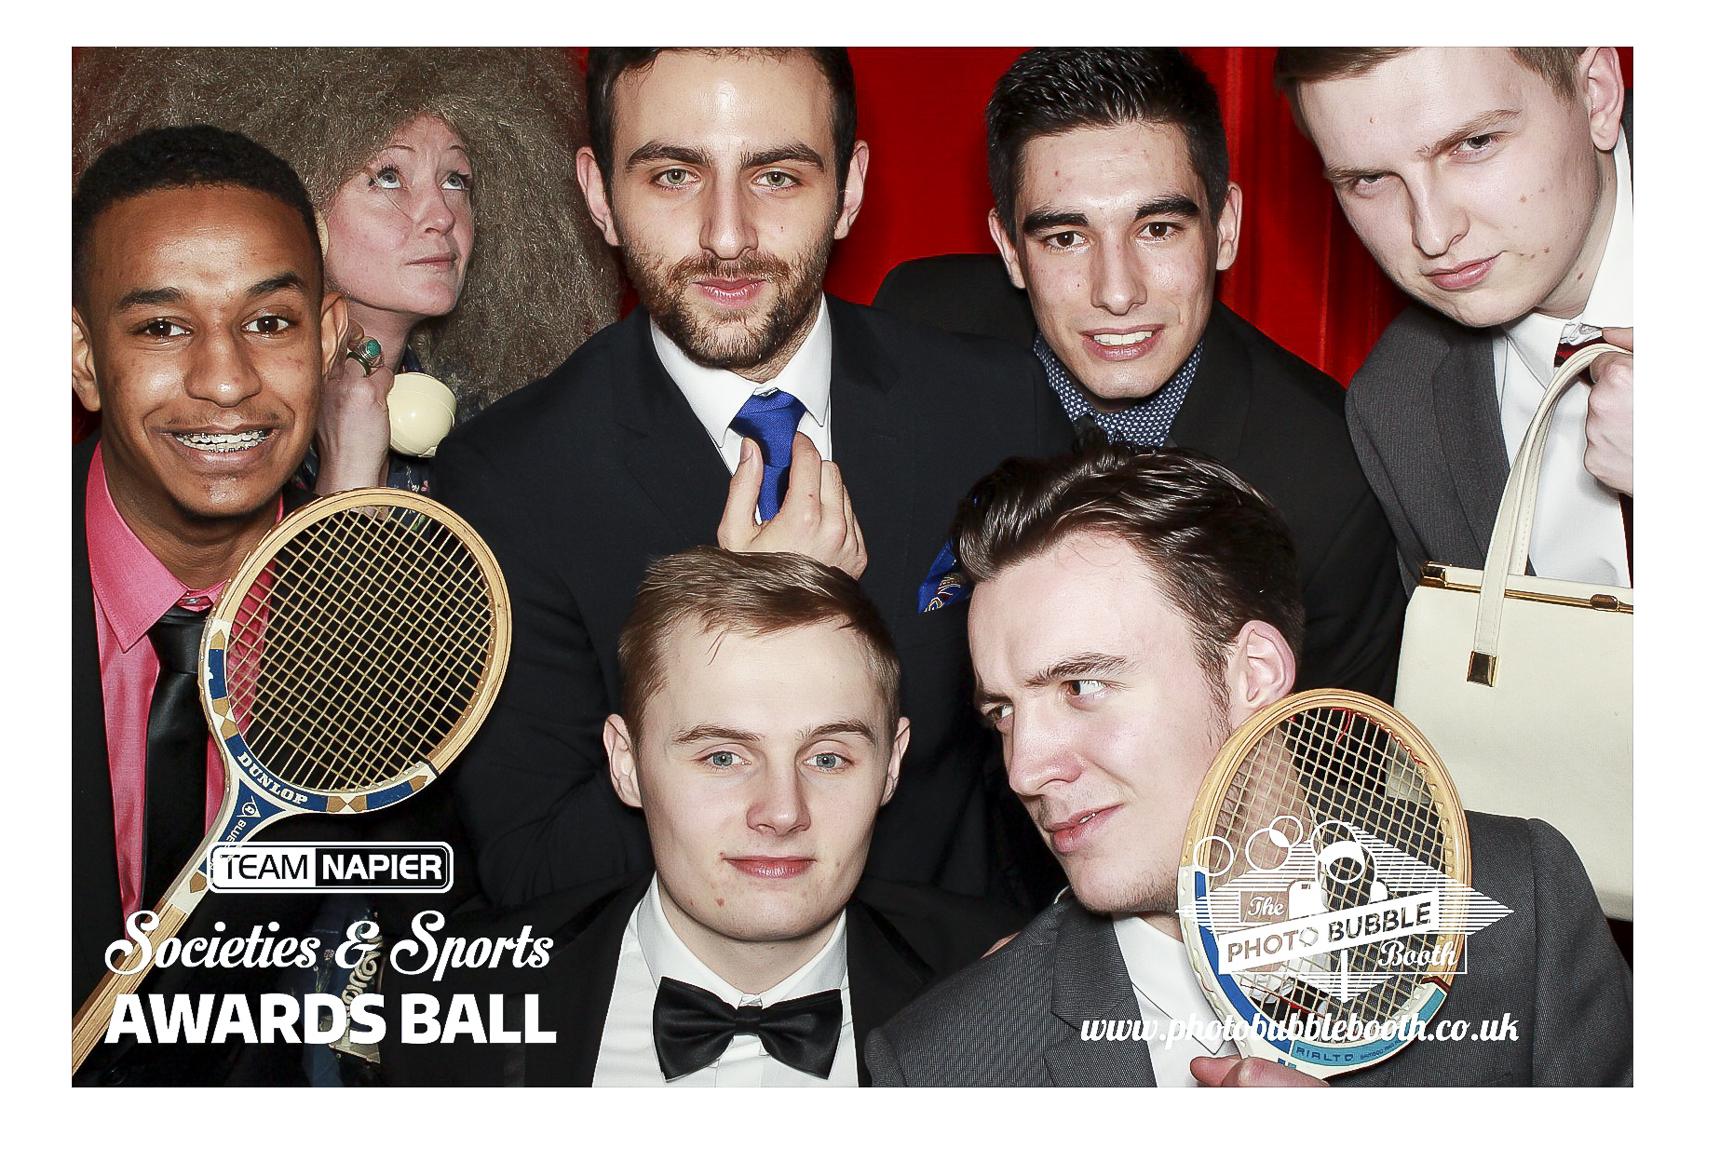 Napier Societies & Sports Awards_70.JPG